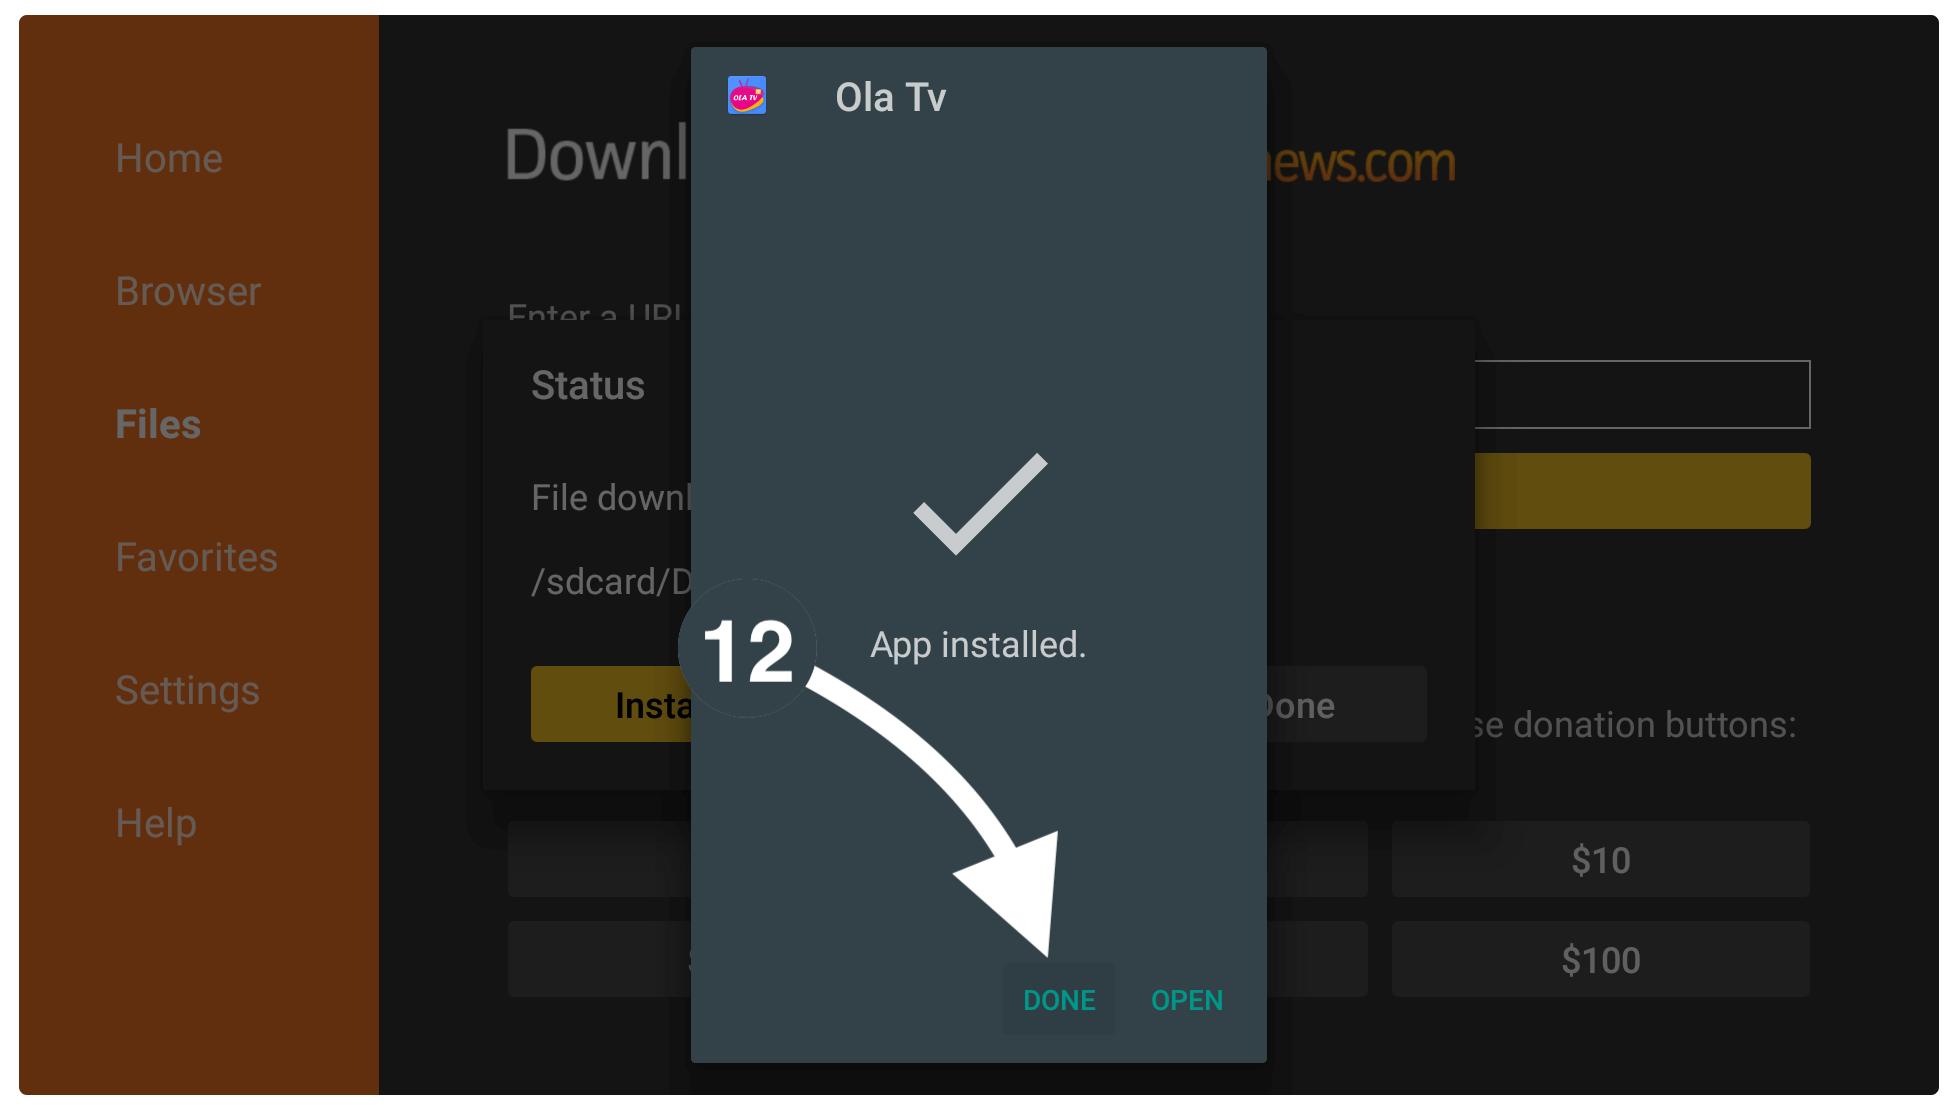 Ola-Tv-Installed-On-Firestick